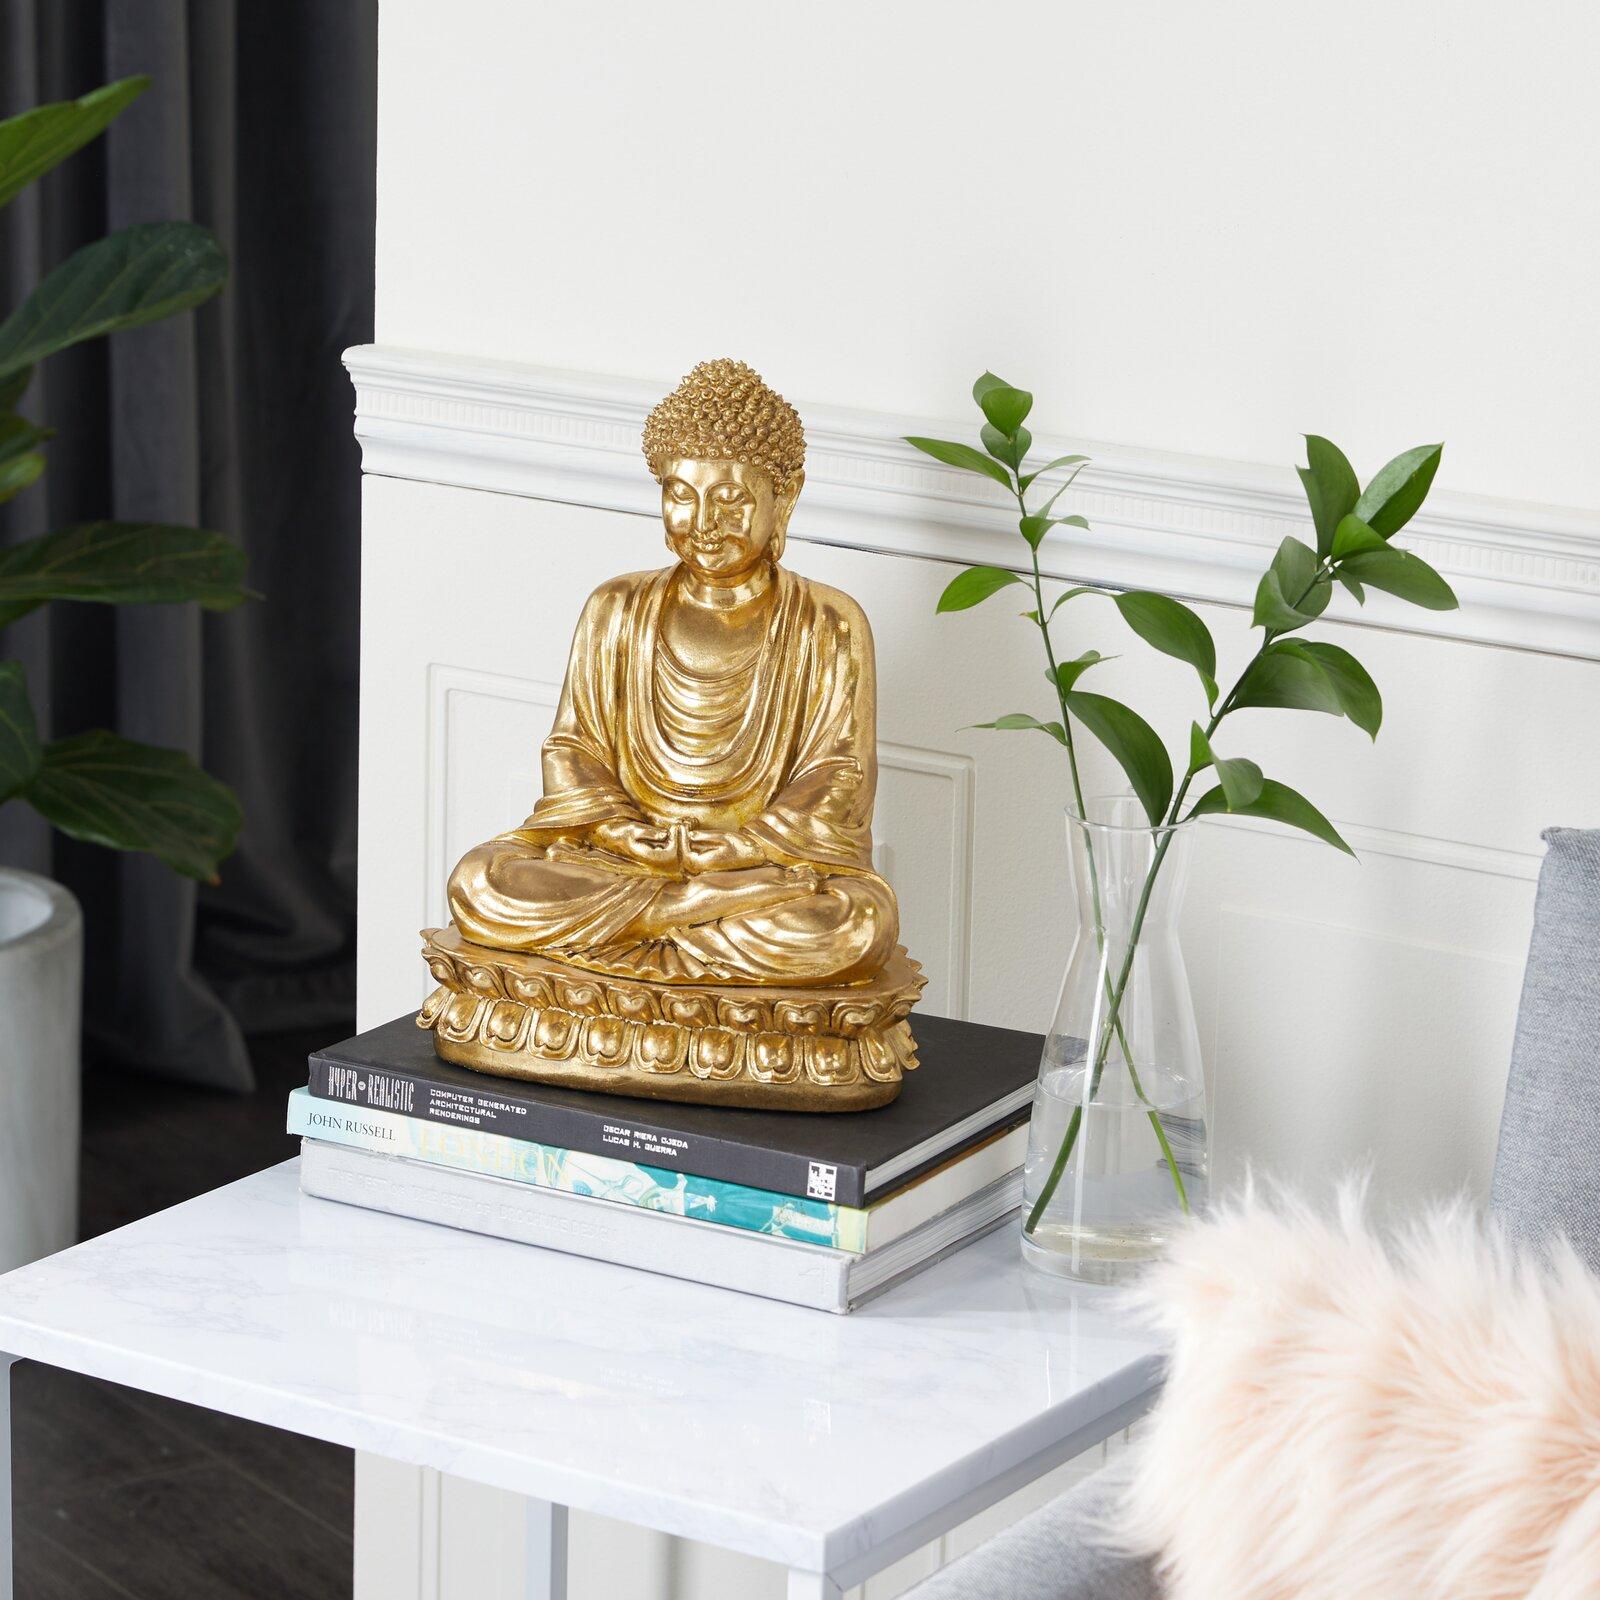 small-sakyamuni-buddha-statue-metallic-gold-finish-elegant-interior-decor-ideas-for-inner-peace-spirituality